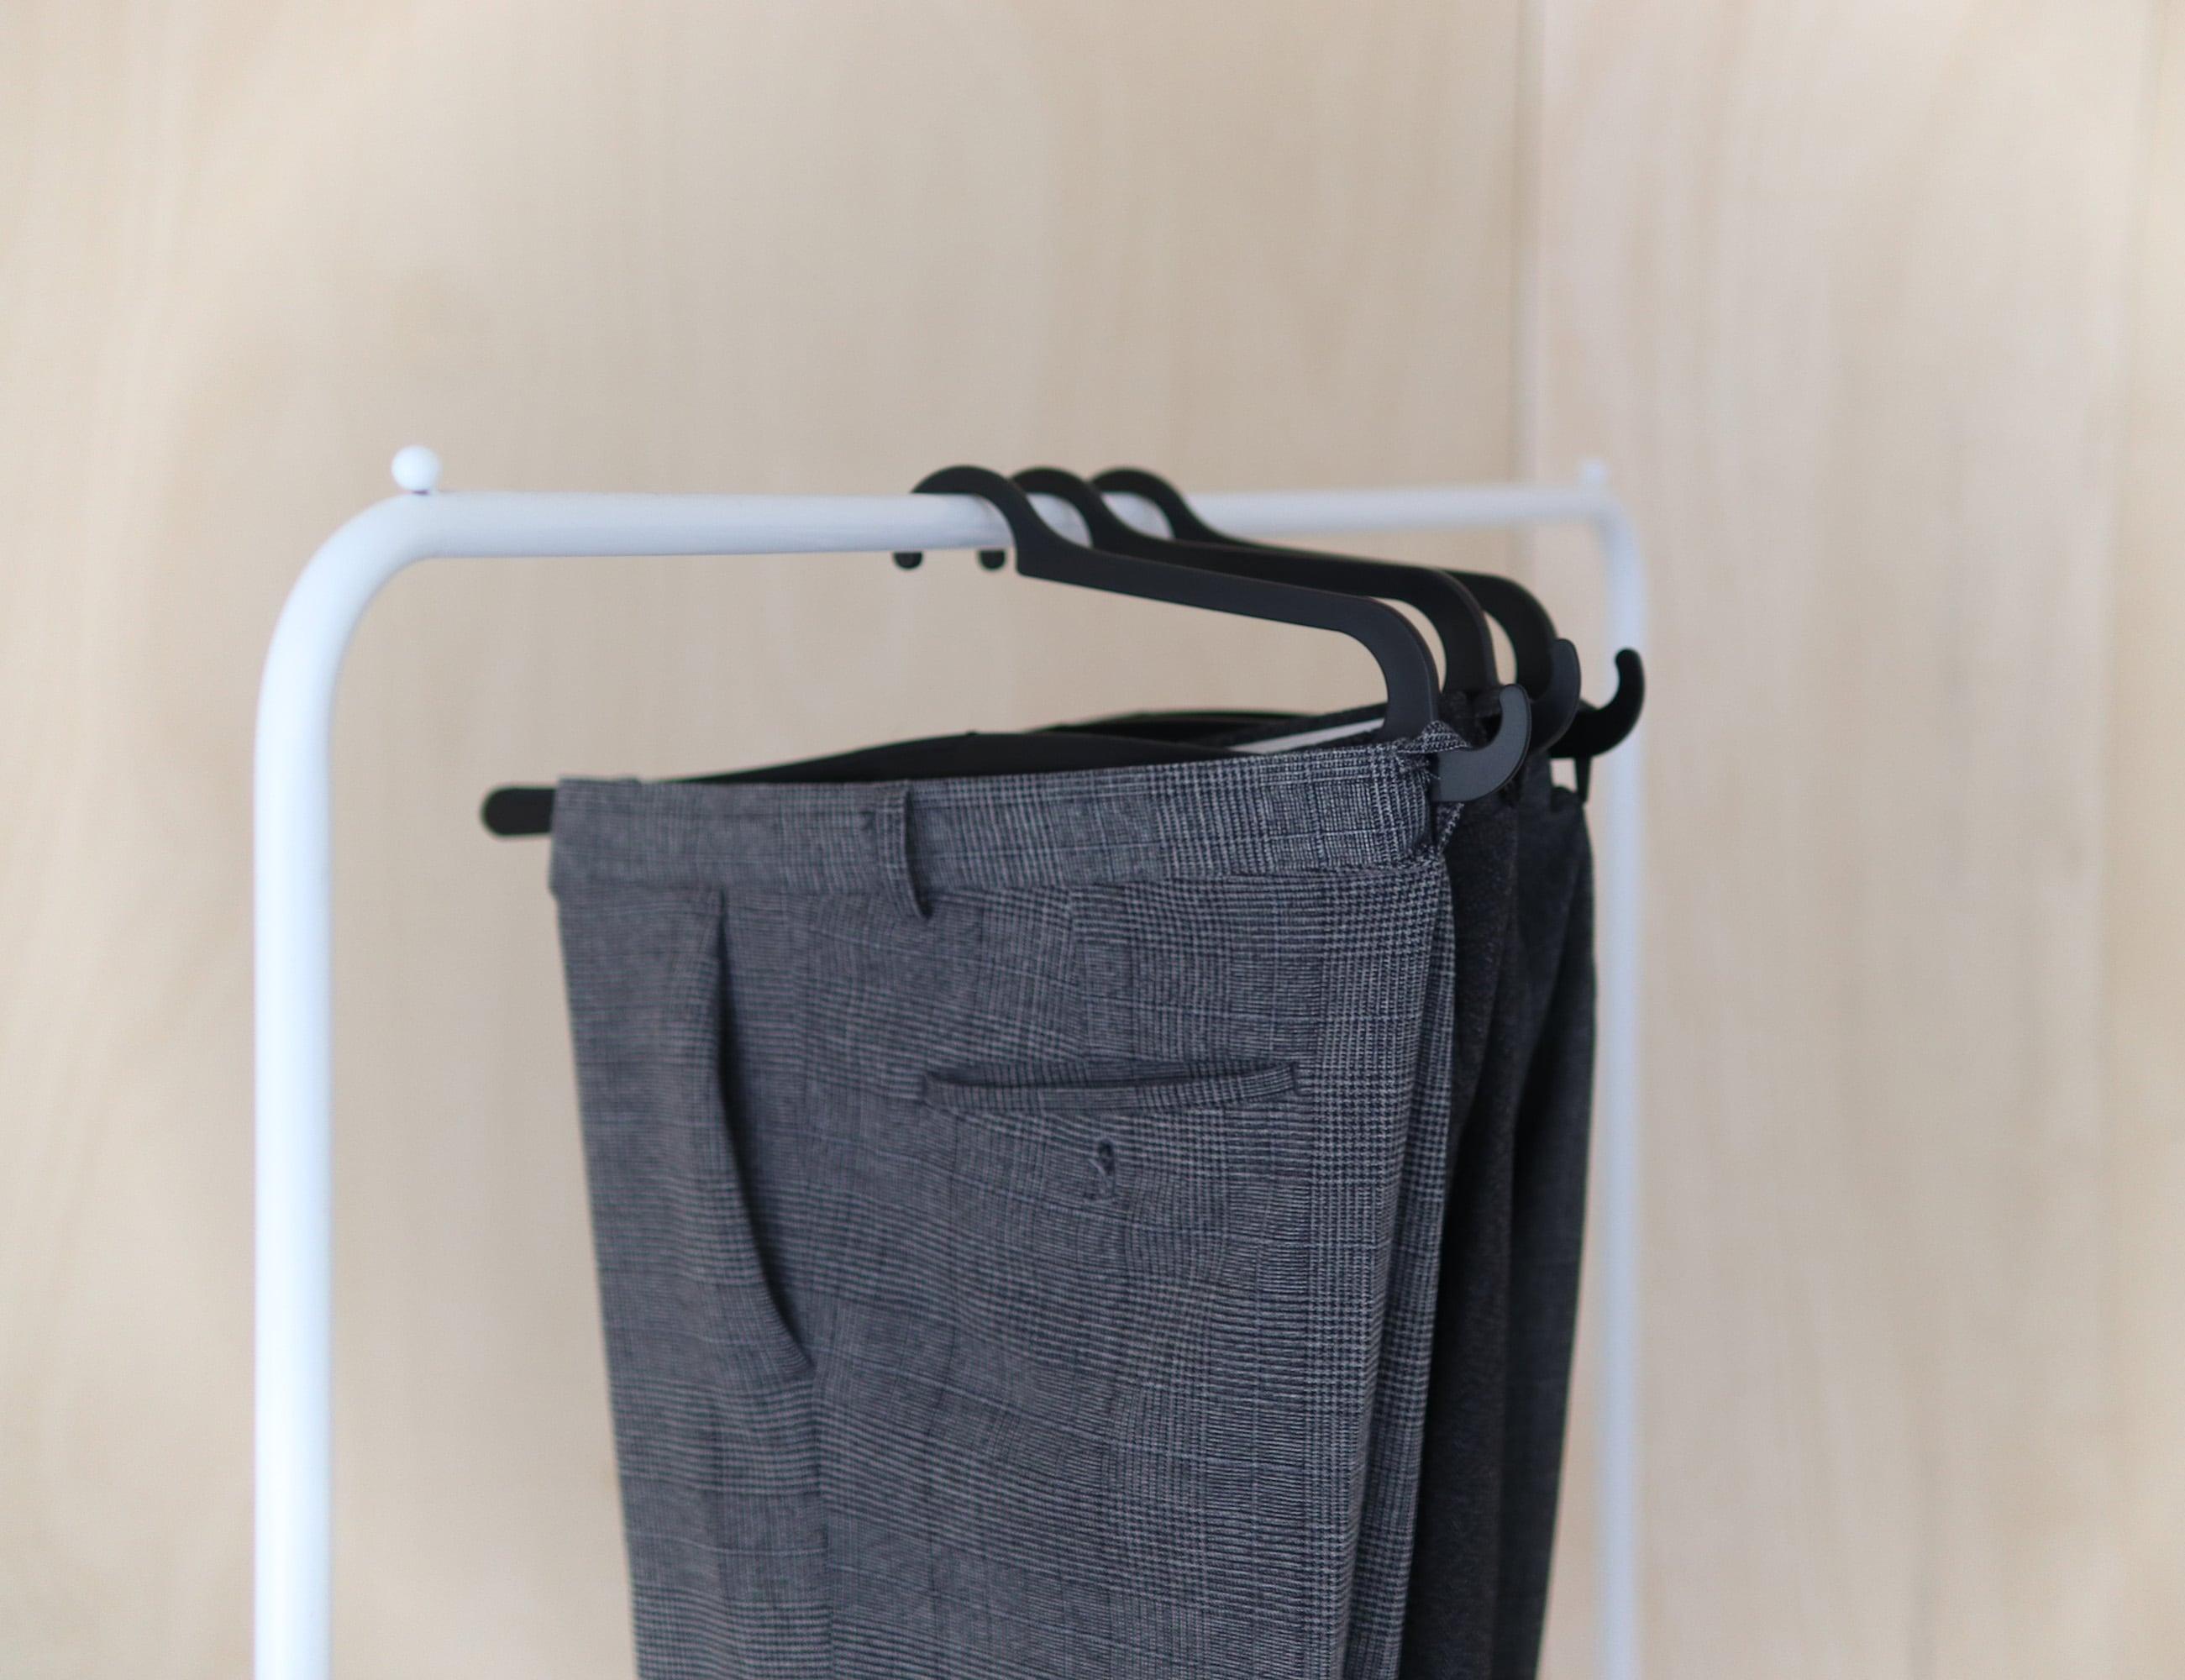 Hurdle Hanger One Second Pants Hanger